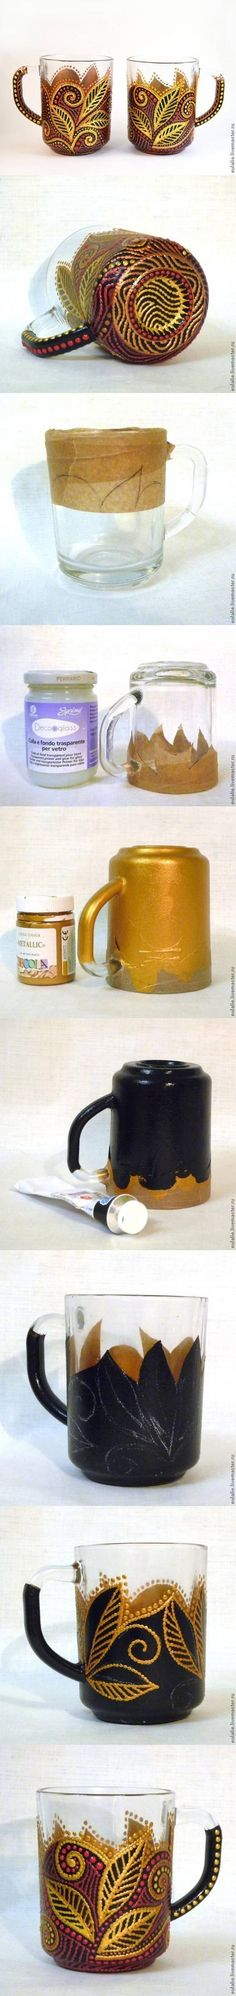 DIY Dot Painted Mug